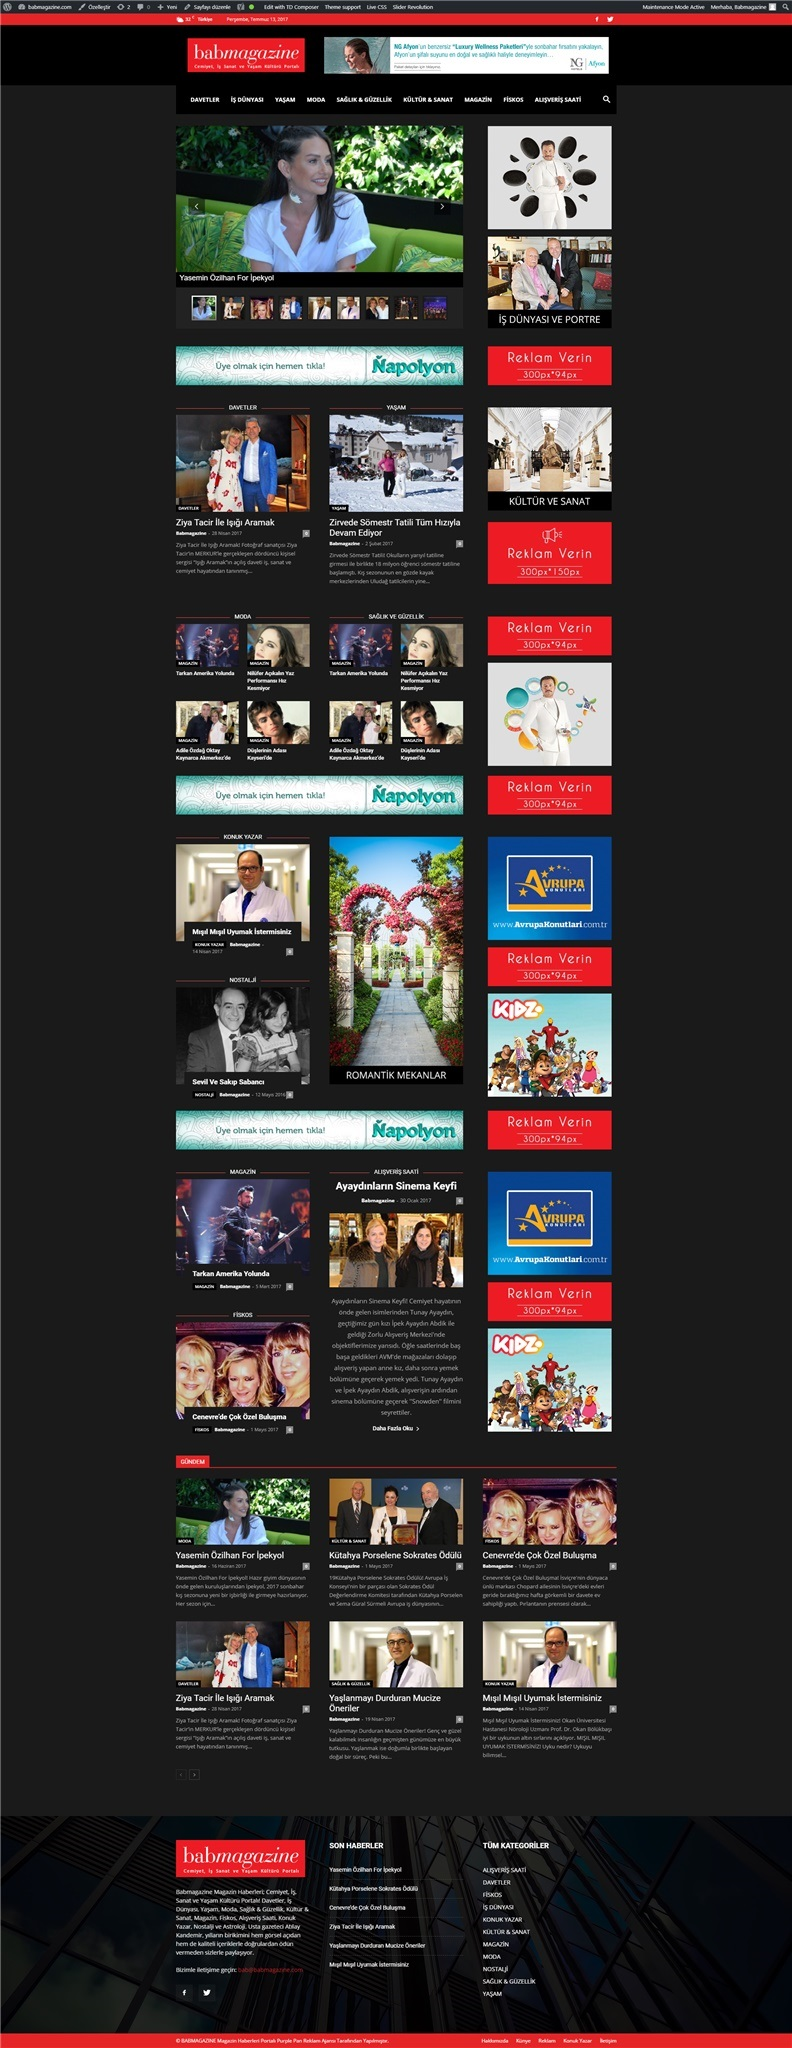 Babmagazine Website